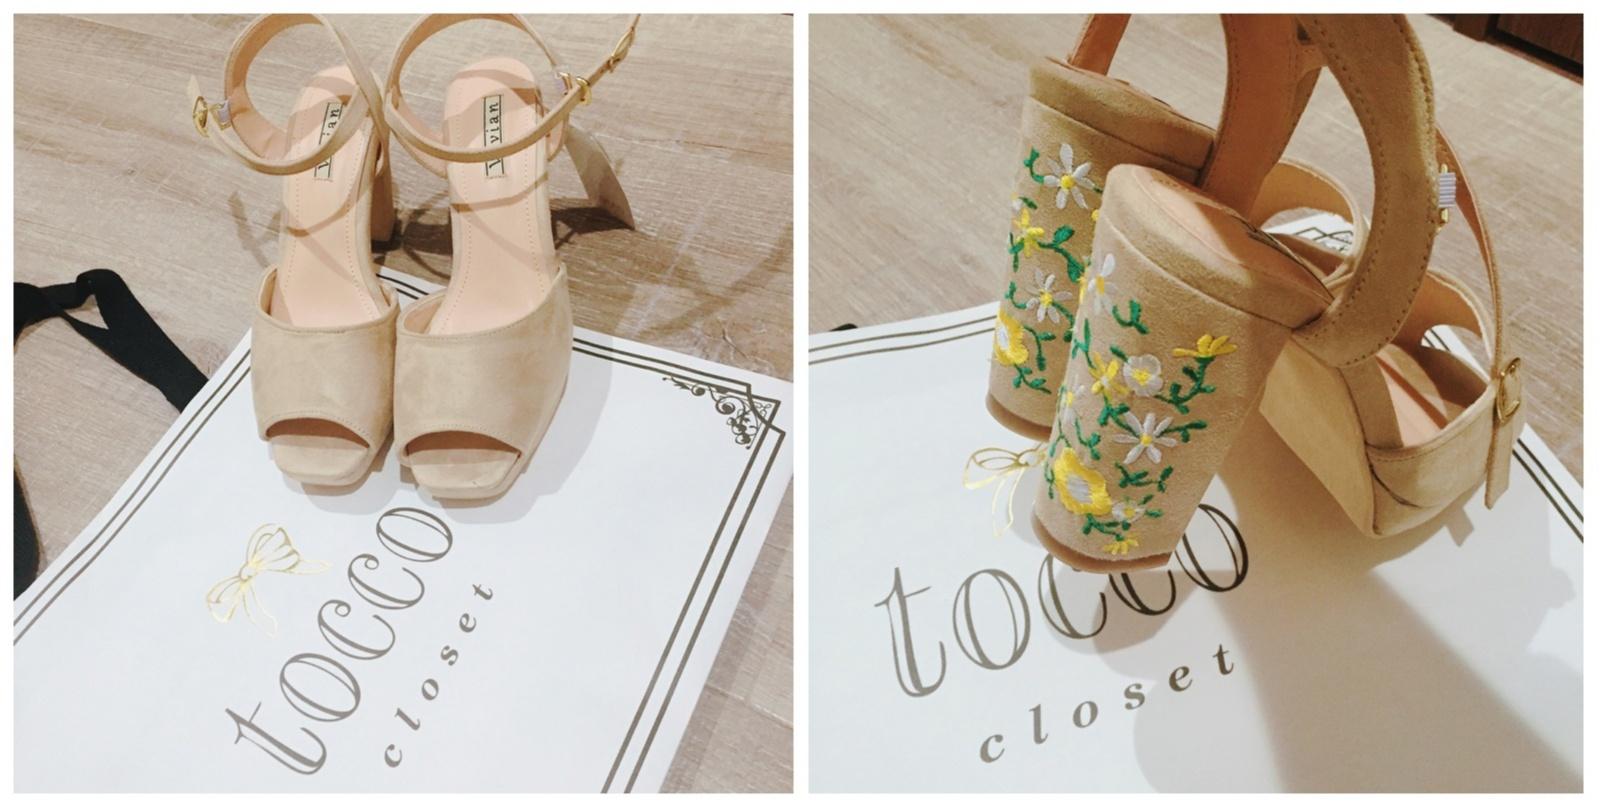 toccoのセール!2017年トレンド「刺繍入り」サンダルを購入したよ♡驚きのプチプライス¥3,000台なのです♩_3